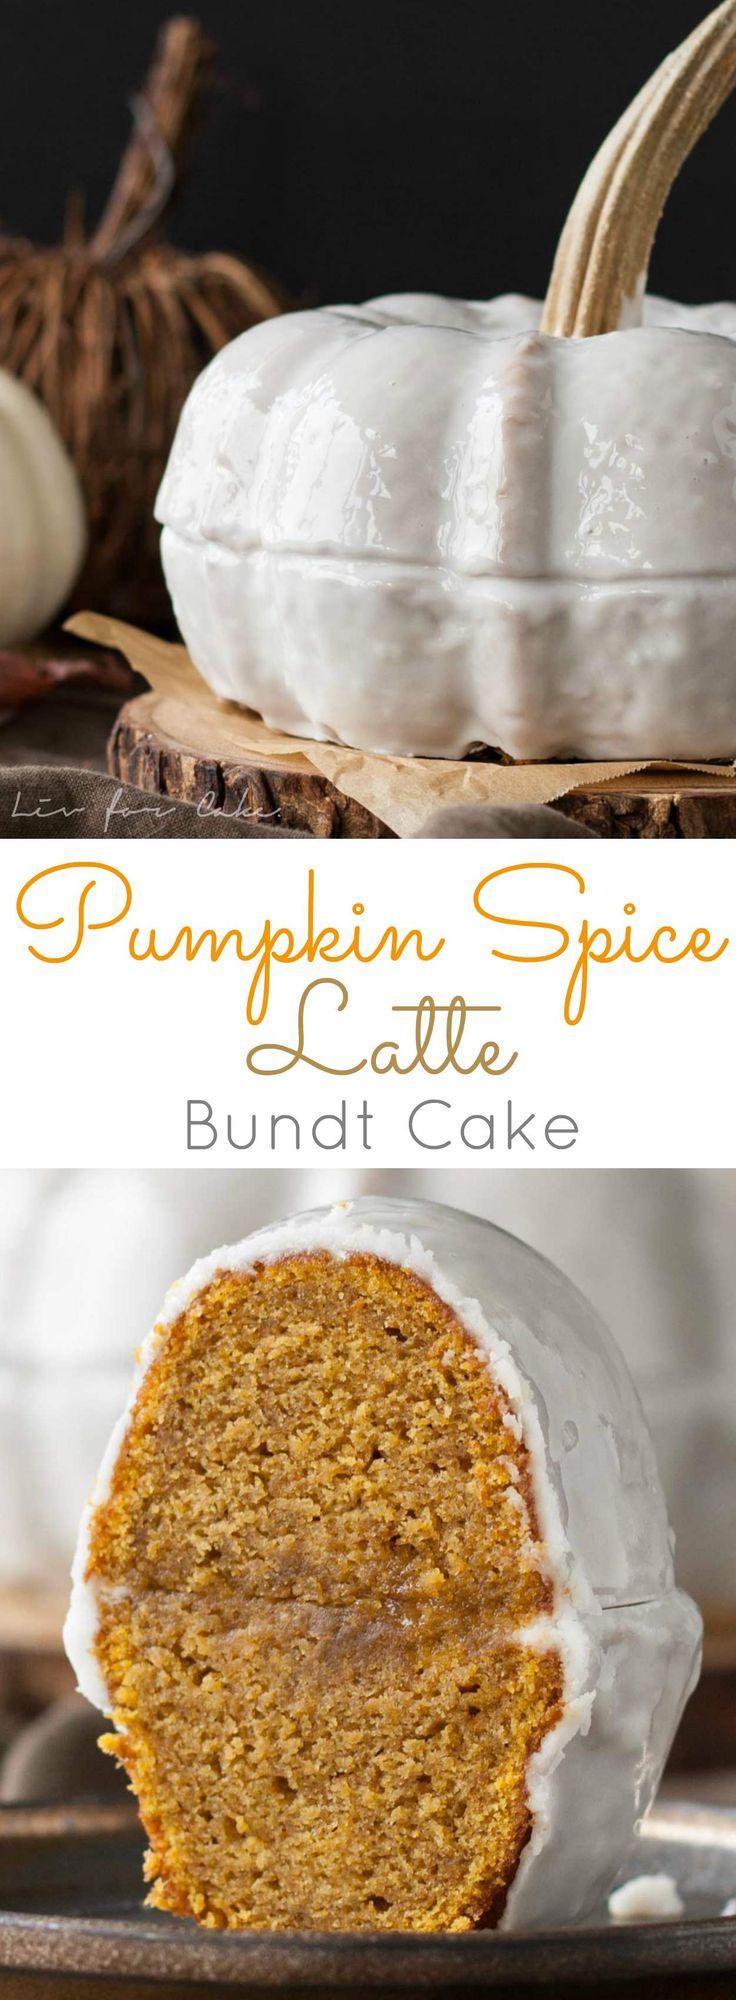 Pumpkin Spice Latte Bundt Cake. Your favourite Fall beverage in a cake! Pumpkin…